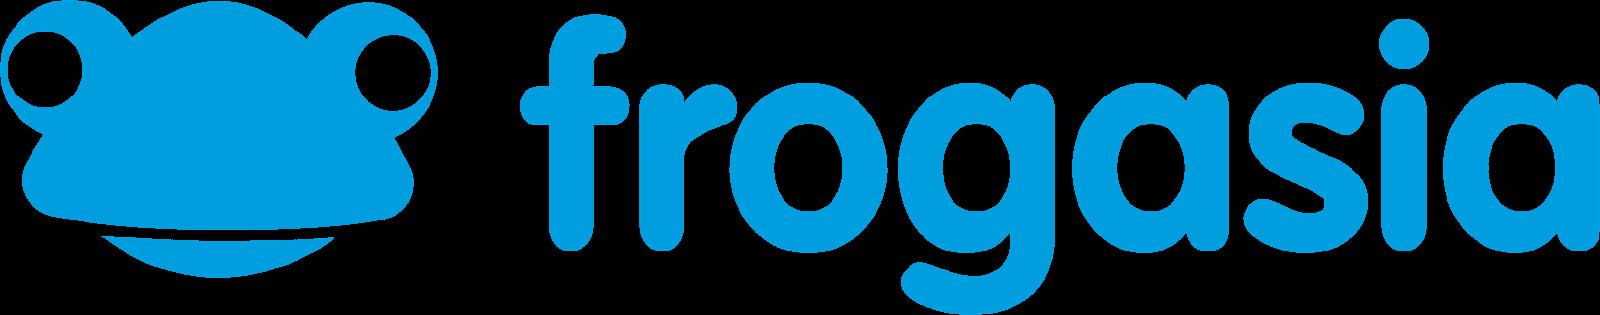 LOGIN/AKTIF FROG VLE DISINI